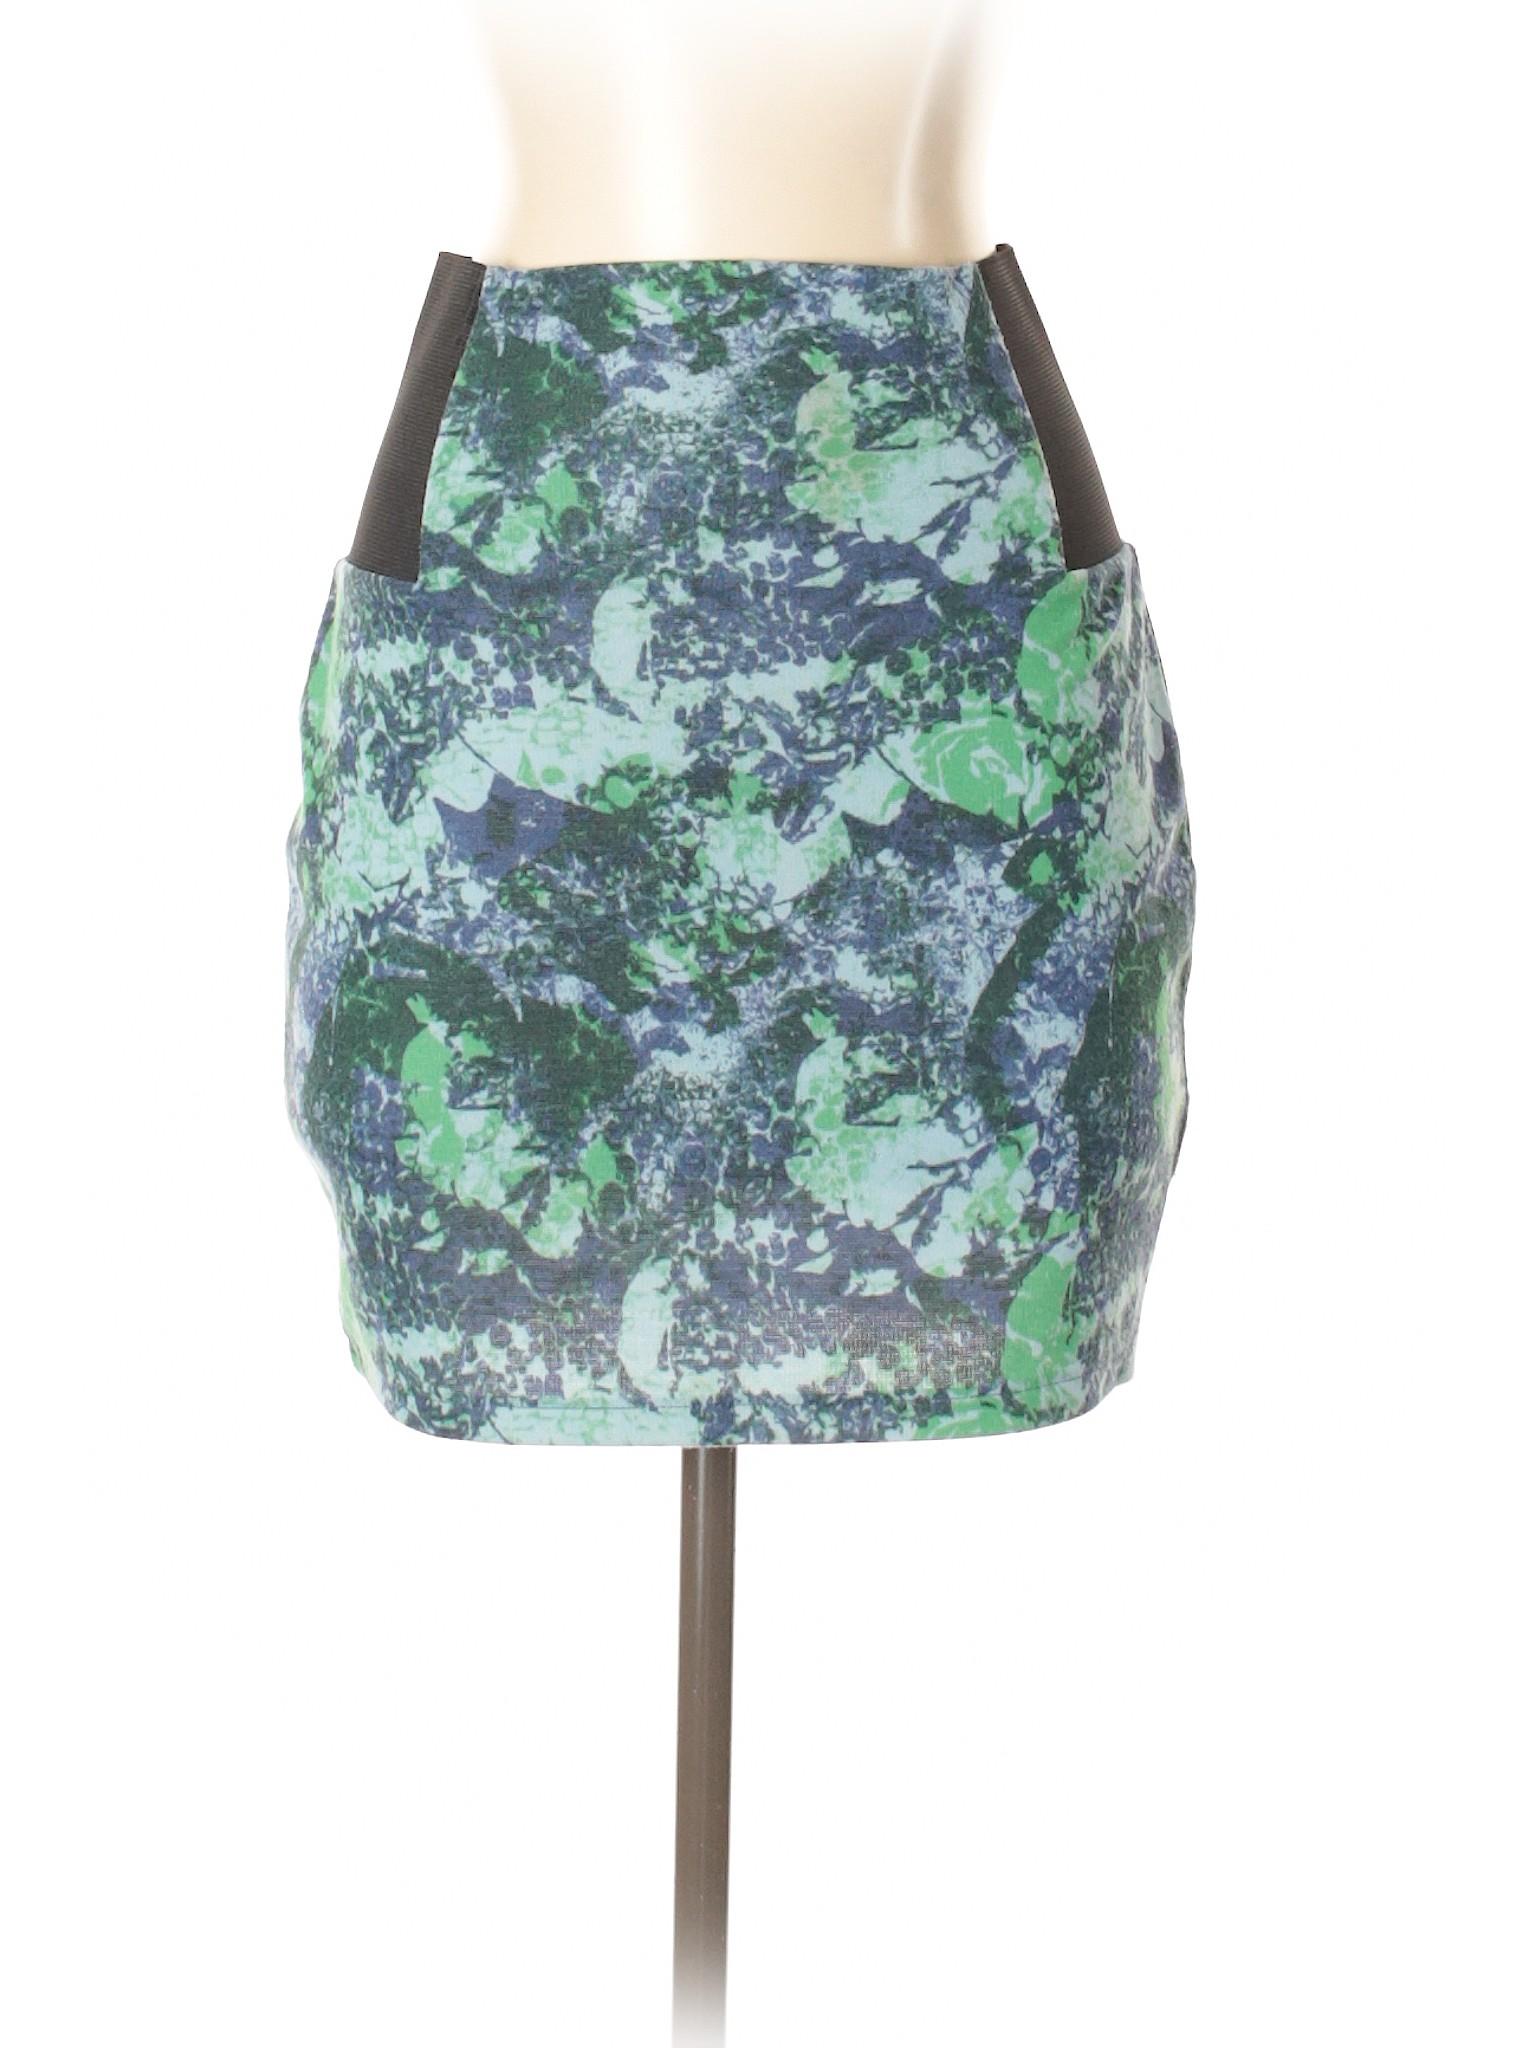 Casual Casual Boutique Boutique Boutique Skirt Boutique Skirt Skirt Casual Casual q5xCRxfXw